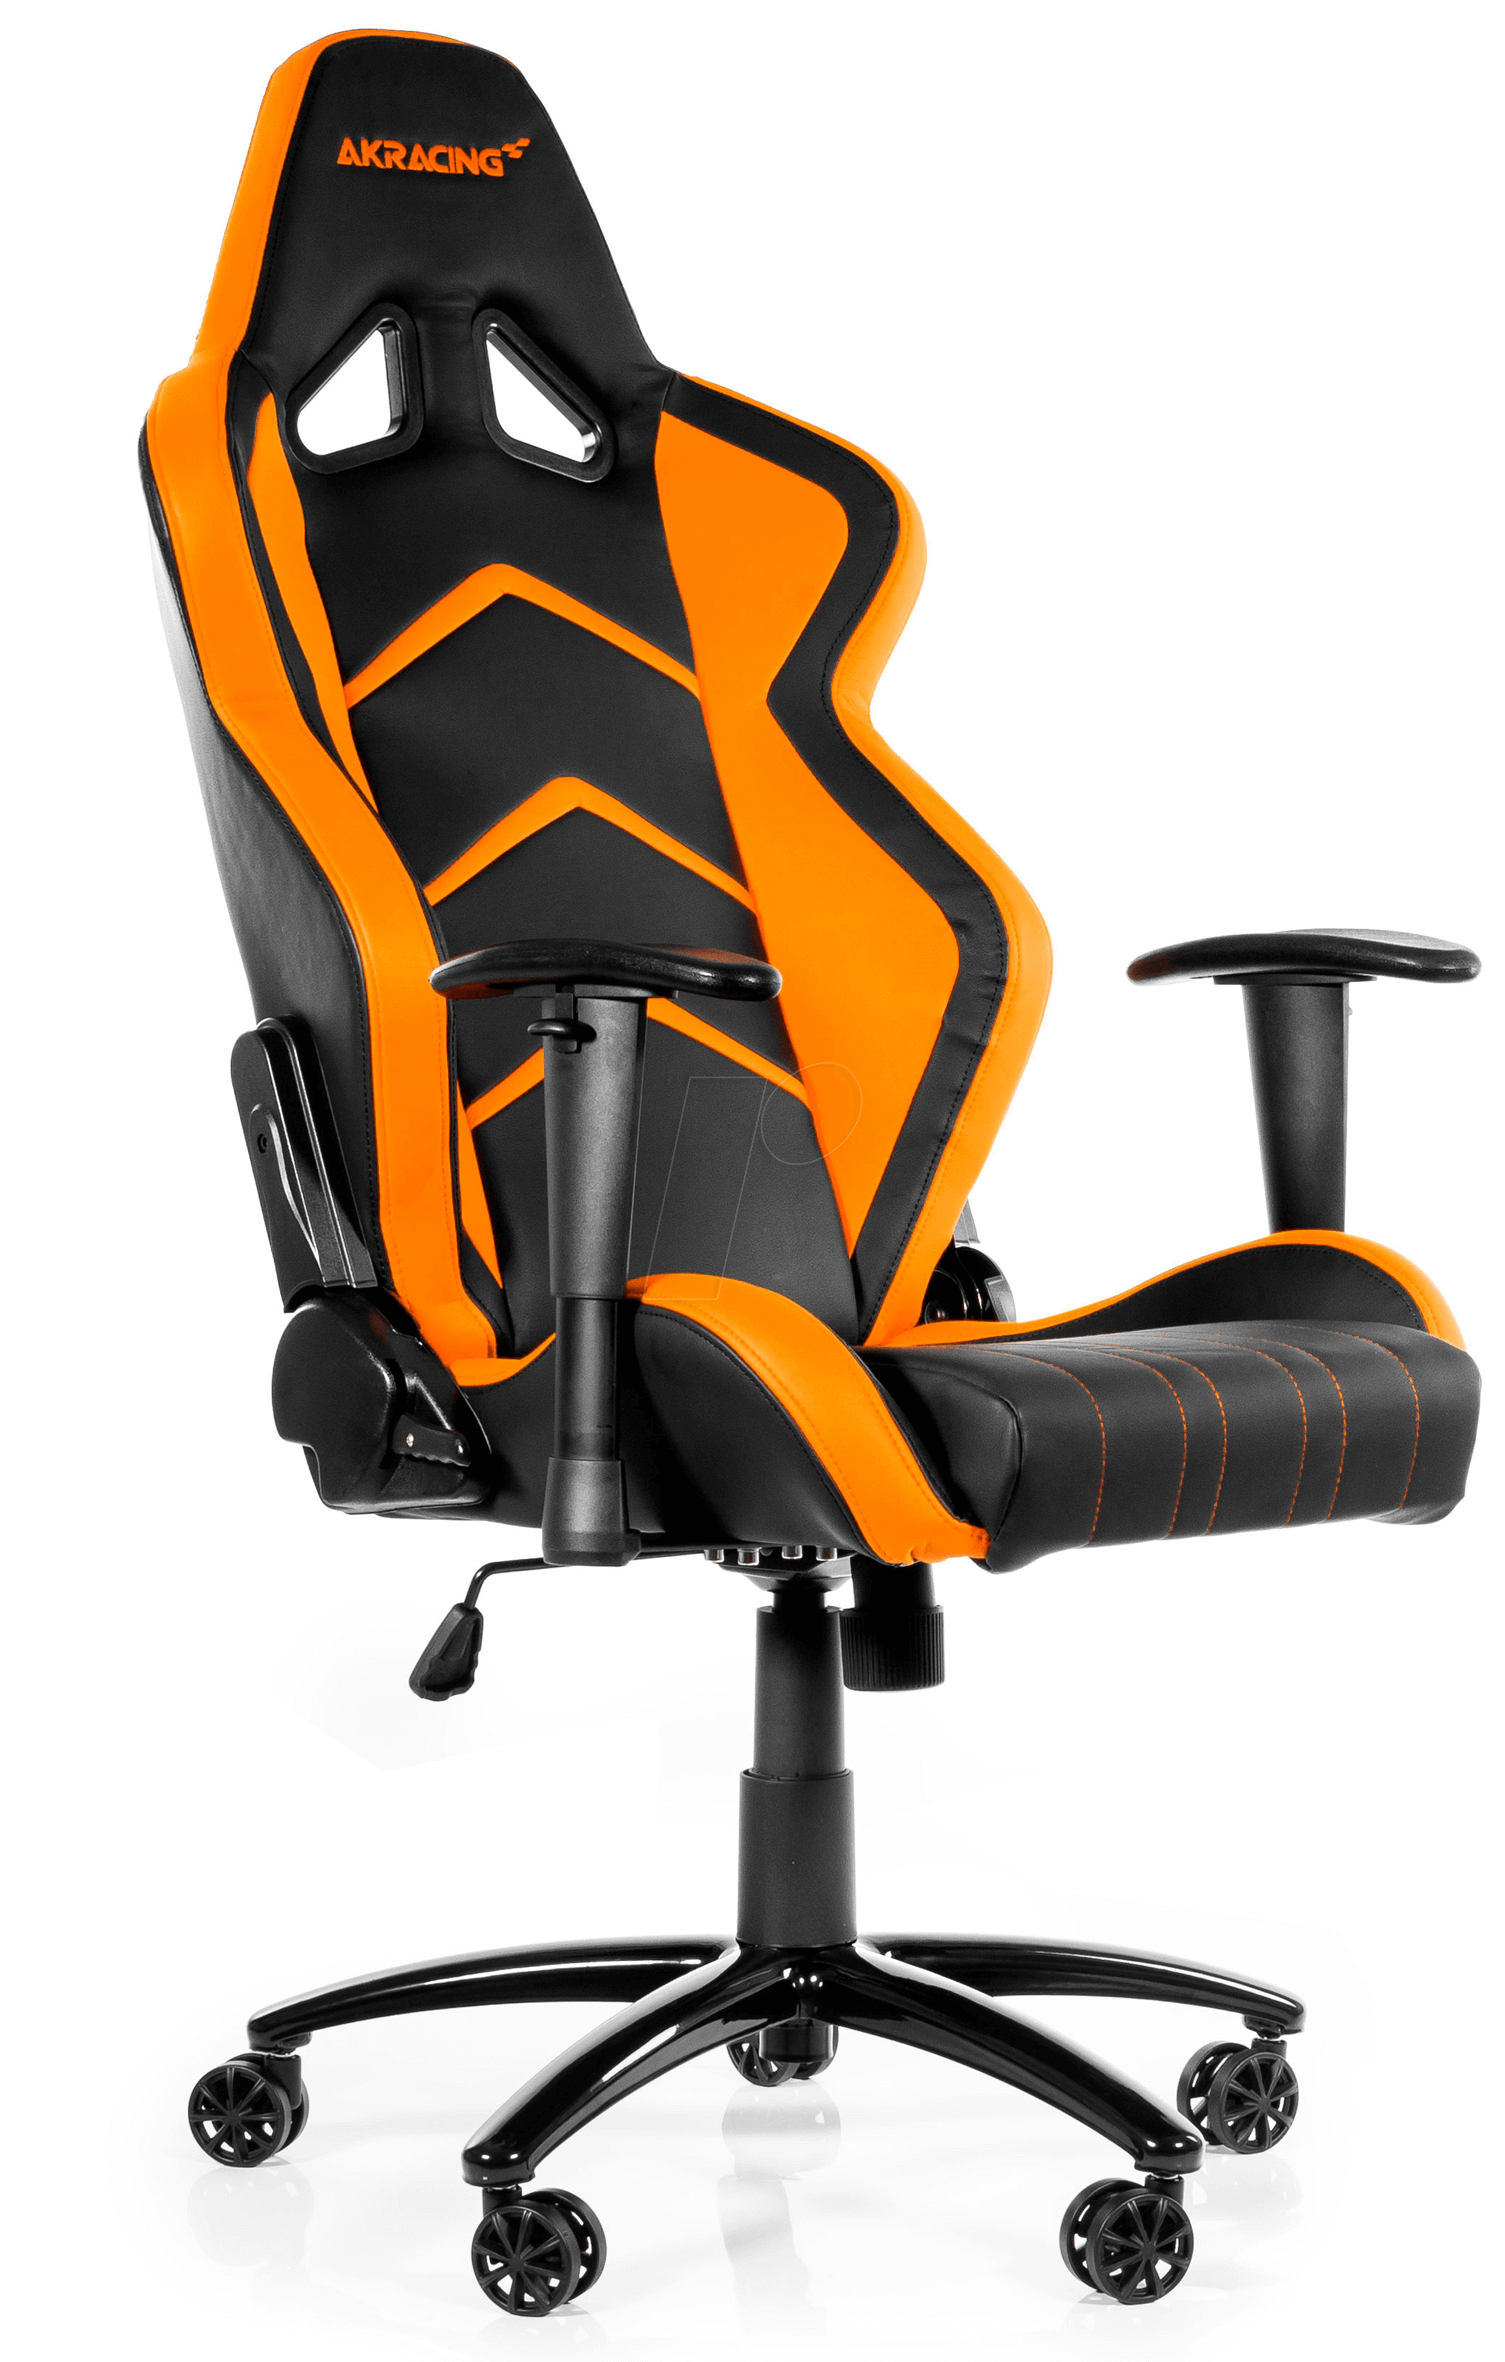 ak k6014 bo gaming stuhl akracing player schwarz orange. Black Bedroom Furniture Sets. Home Design Ideas